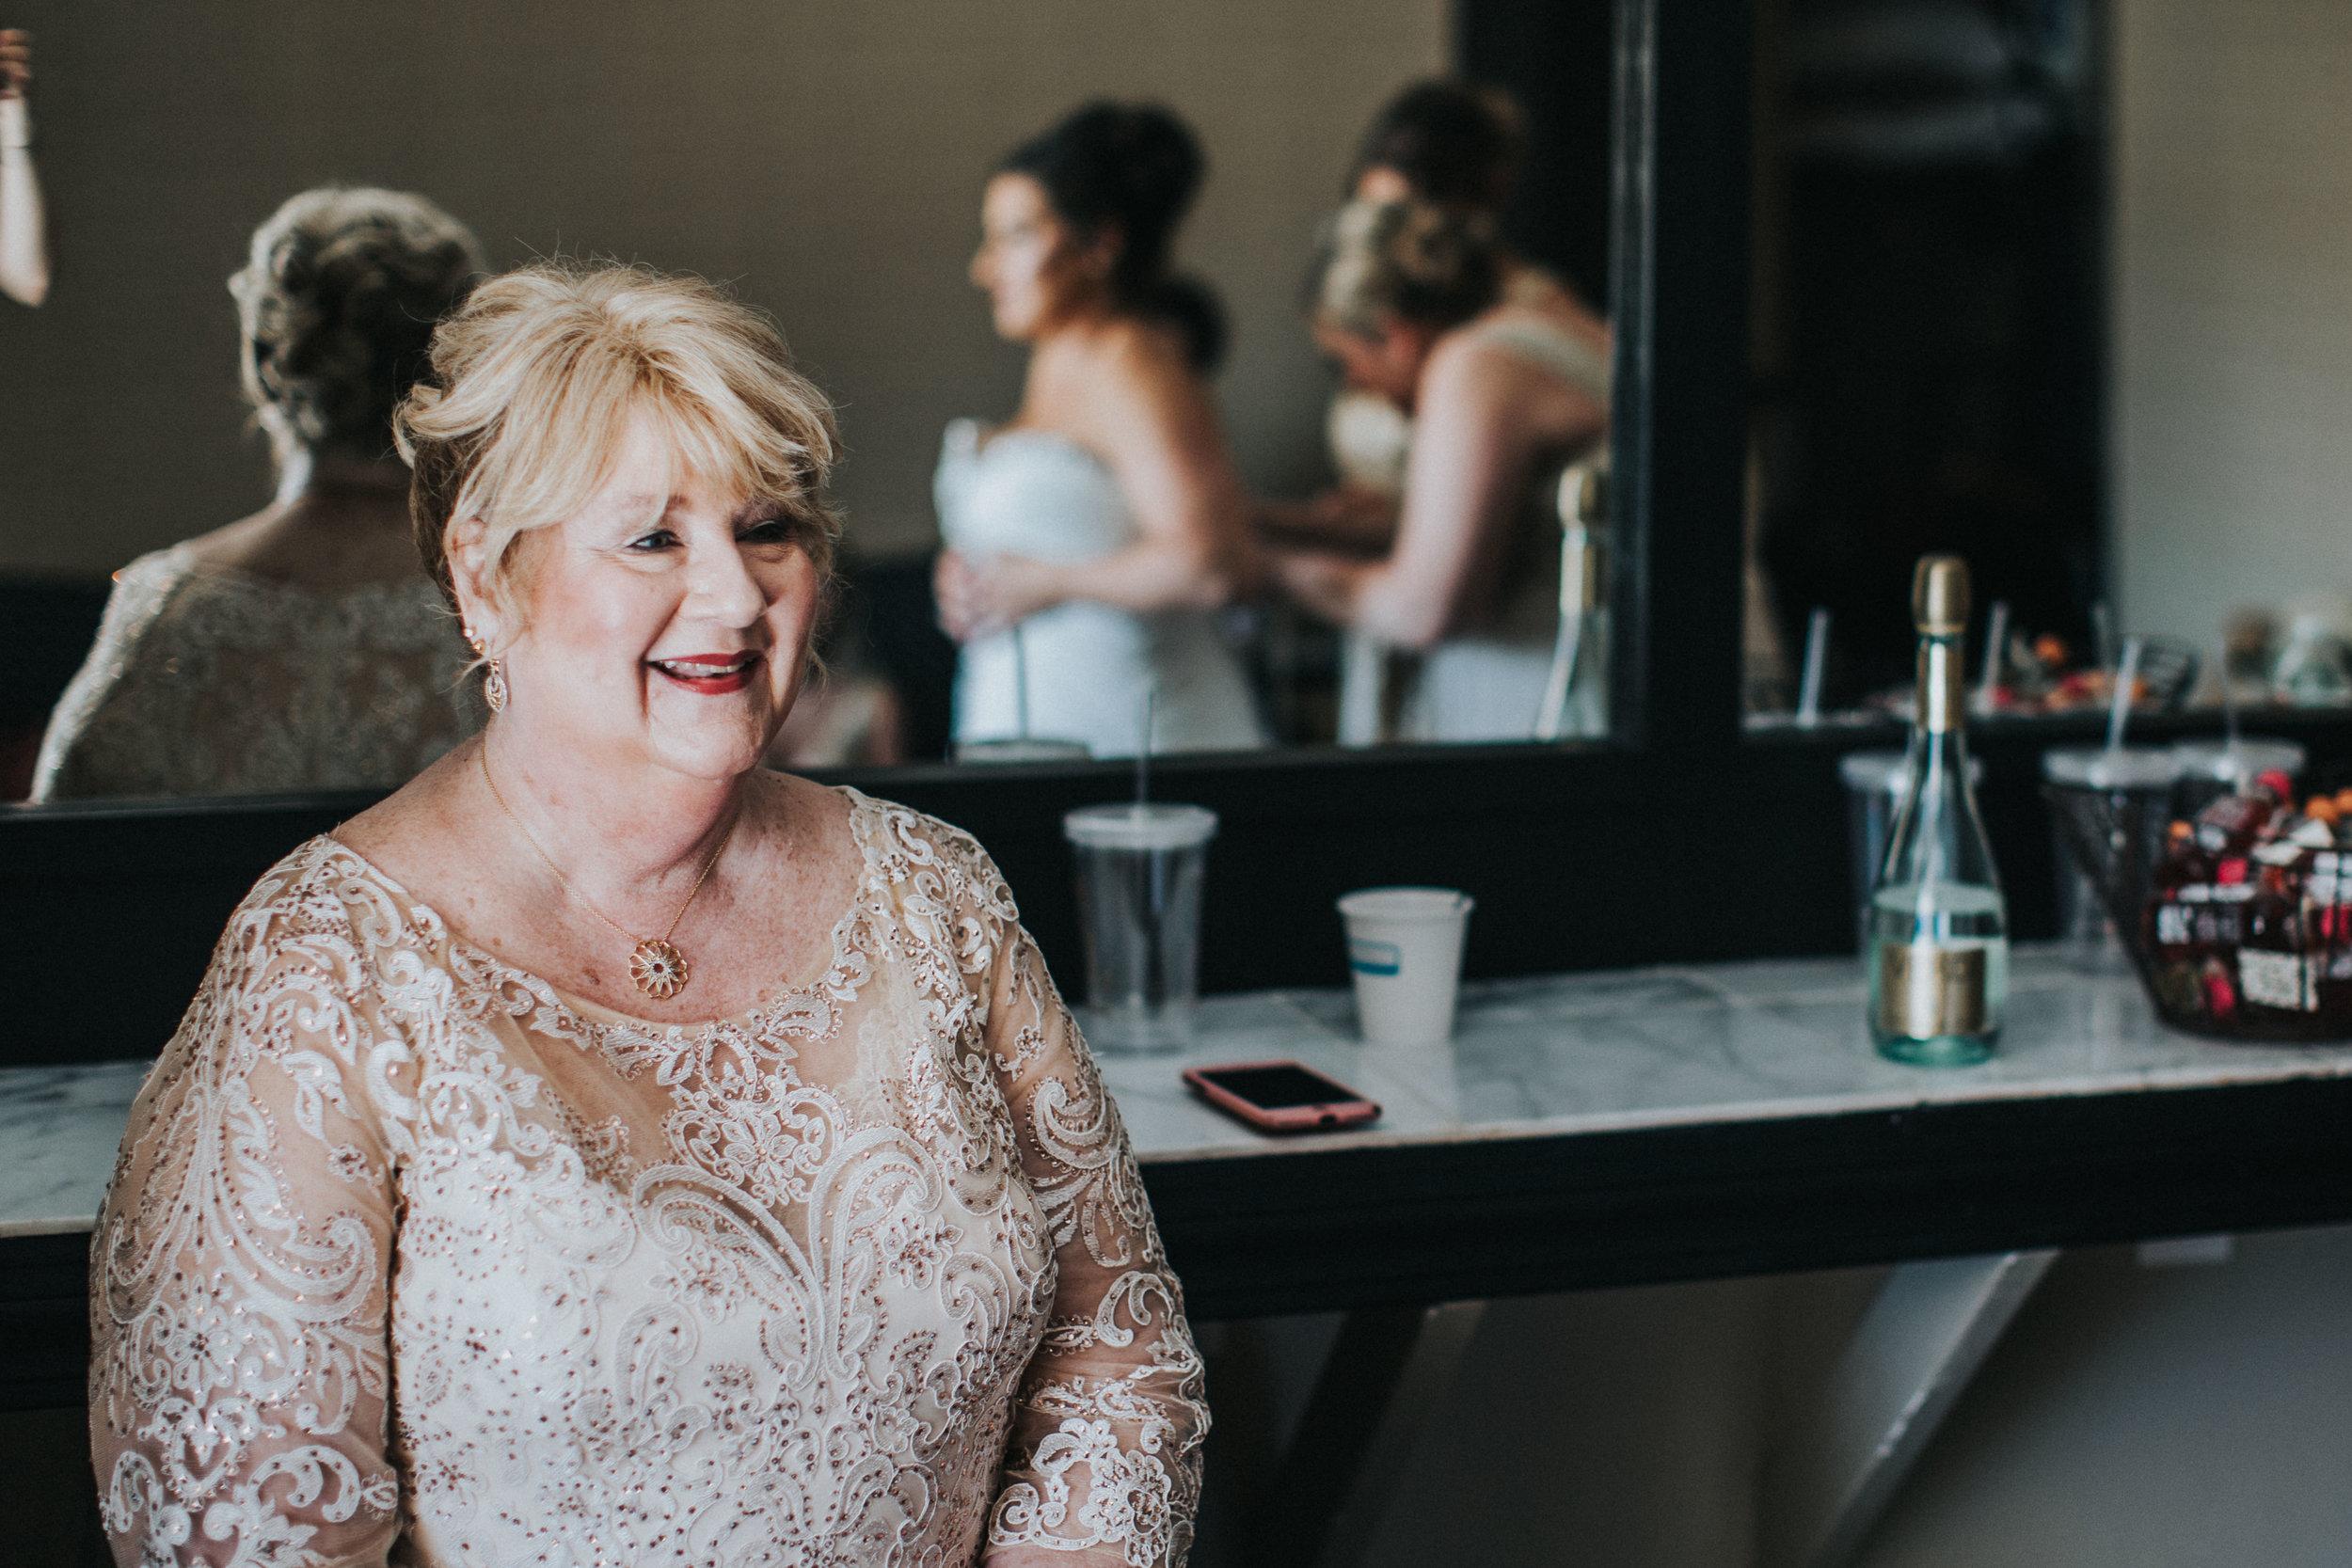 JennaLynnPhotography-NJWeddingPhotographer-Wedding-TheBerkeley-AsburyPark-Allison&Michael-GettingReady-65.jpg